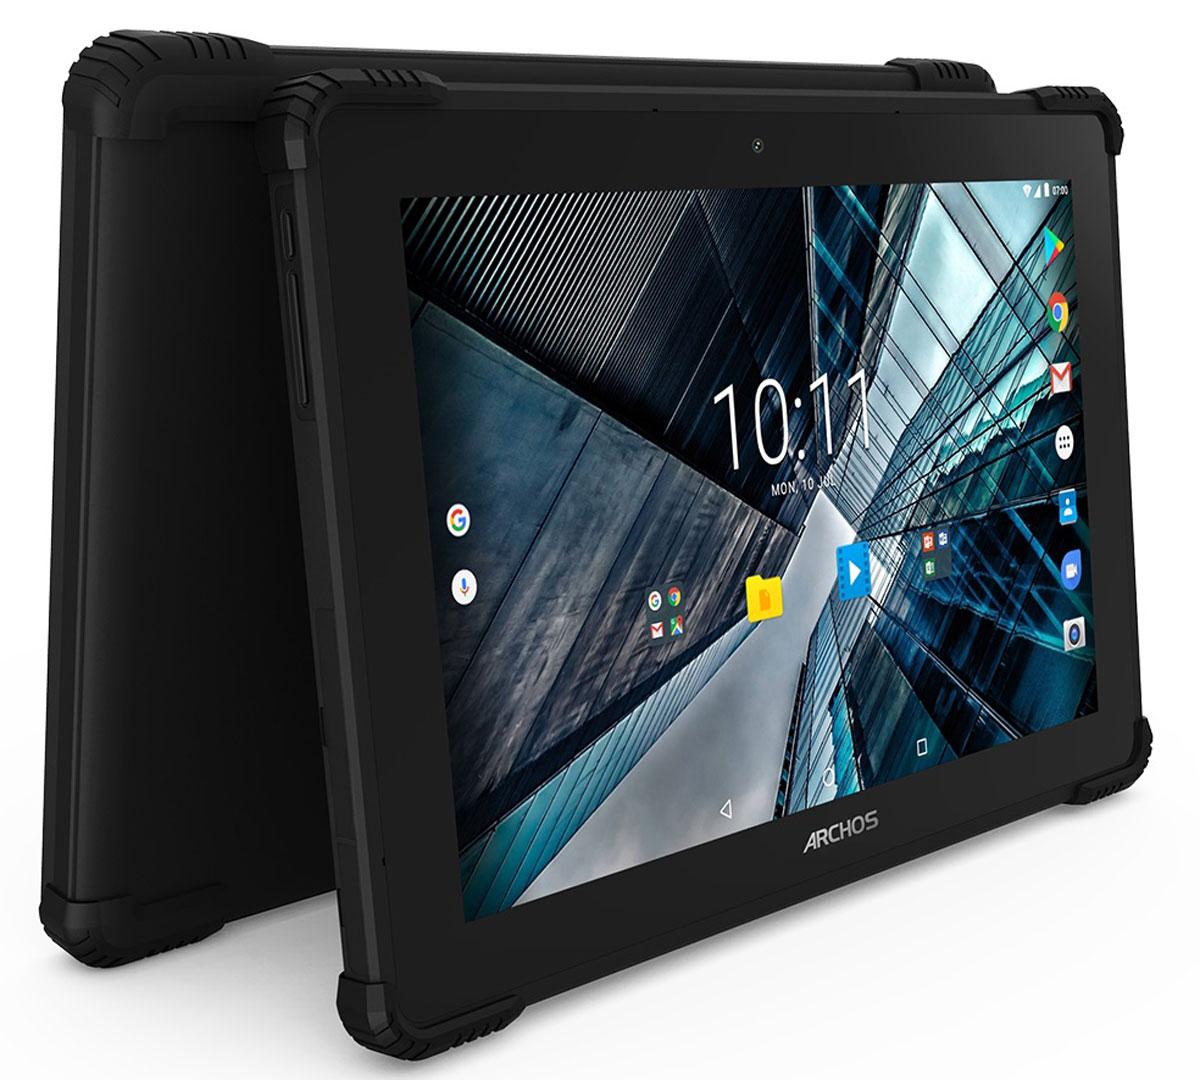 Archos Sense 101X 4G 32GB, Black503451Планшет Archos Sense 101 X Mediatek MK8735 (1.3Ghz)/ 10.1 IPS 1280x800/ RAM 2Gb/ 32Gb/ 4G LTE/ MicroSD slot/ WiFi/ BT/ Front & Back Cam/ 6000 mAh/ IP54/ Android 7.0/ Black